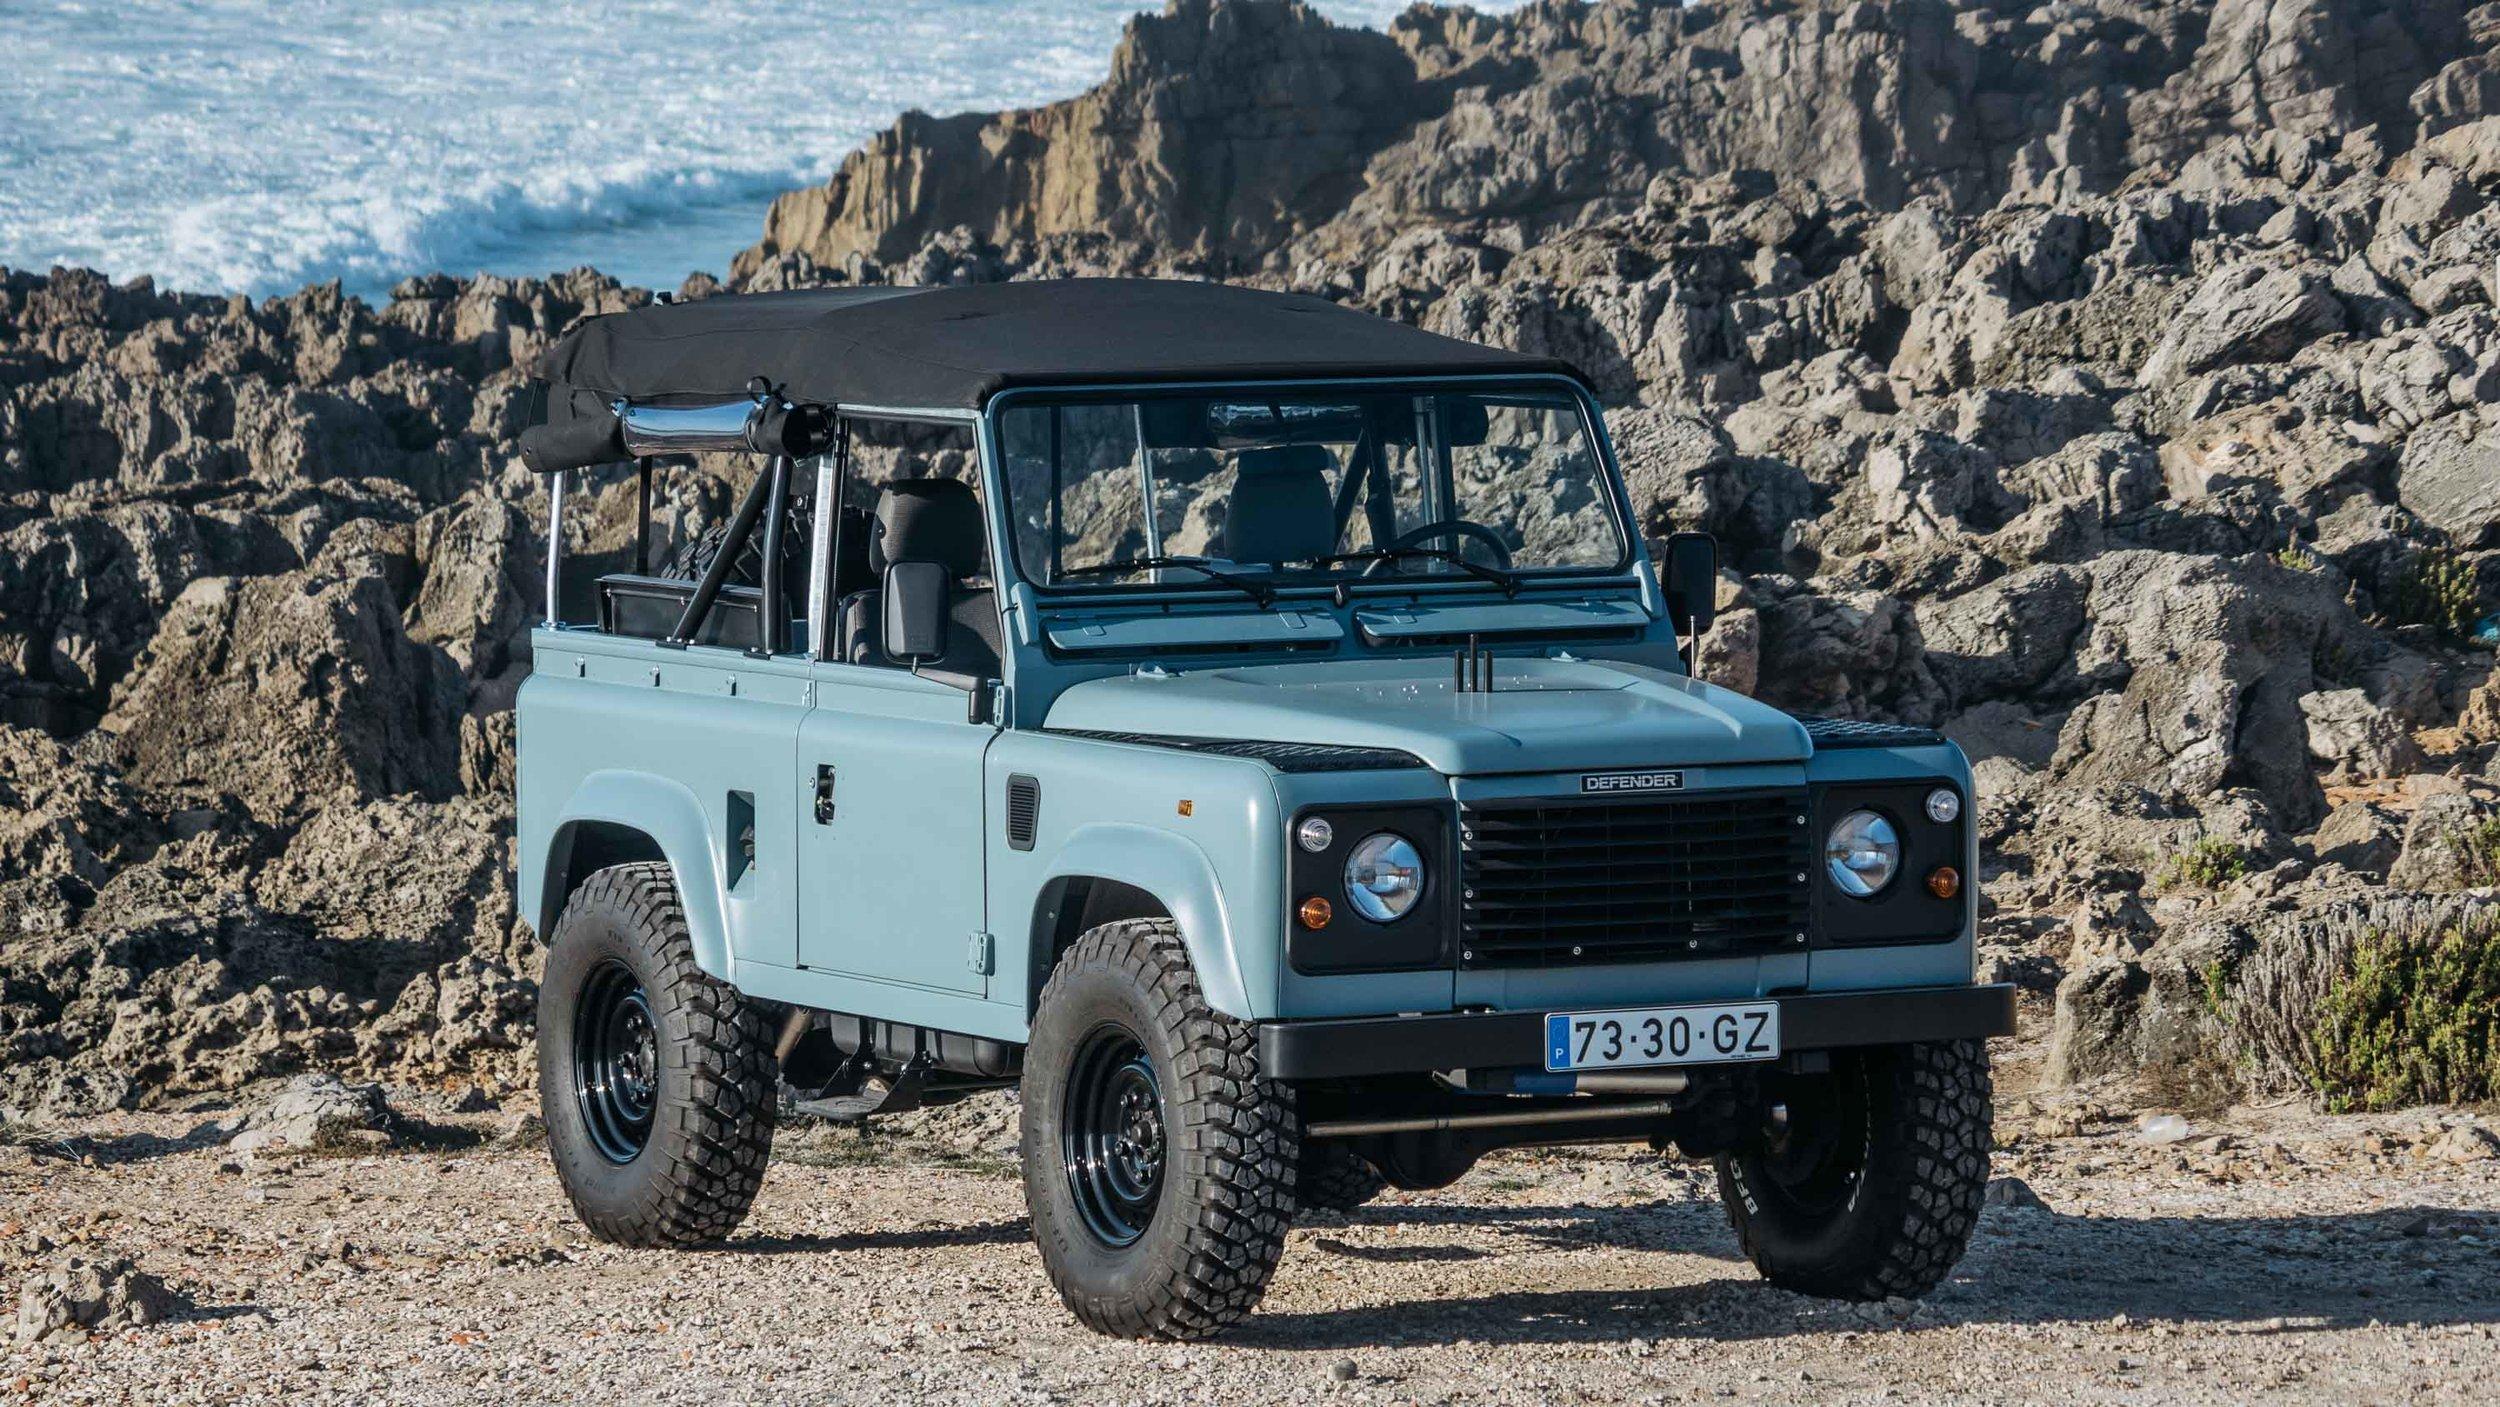 coolnvintage Land Rover Defender (75 of 98).jpg